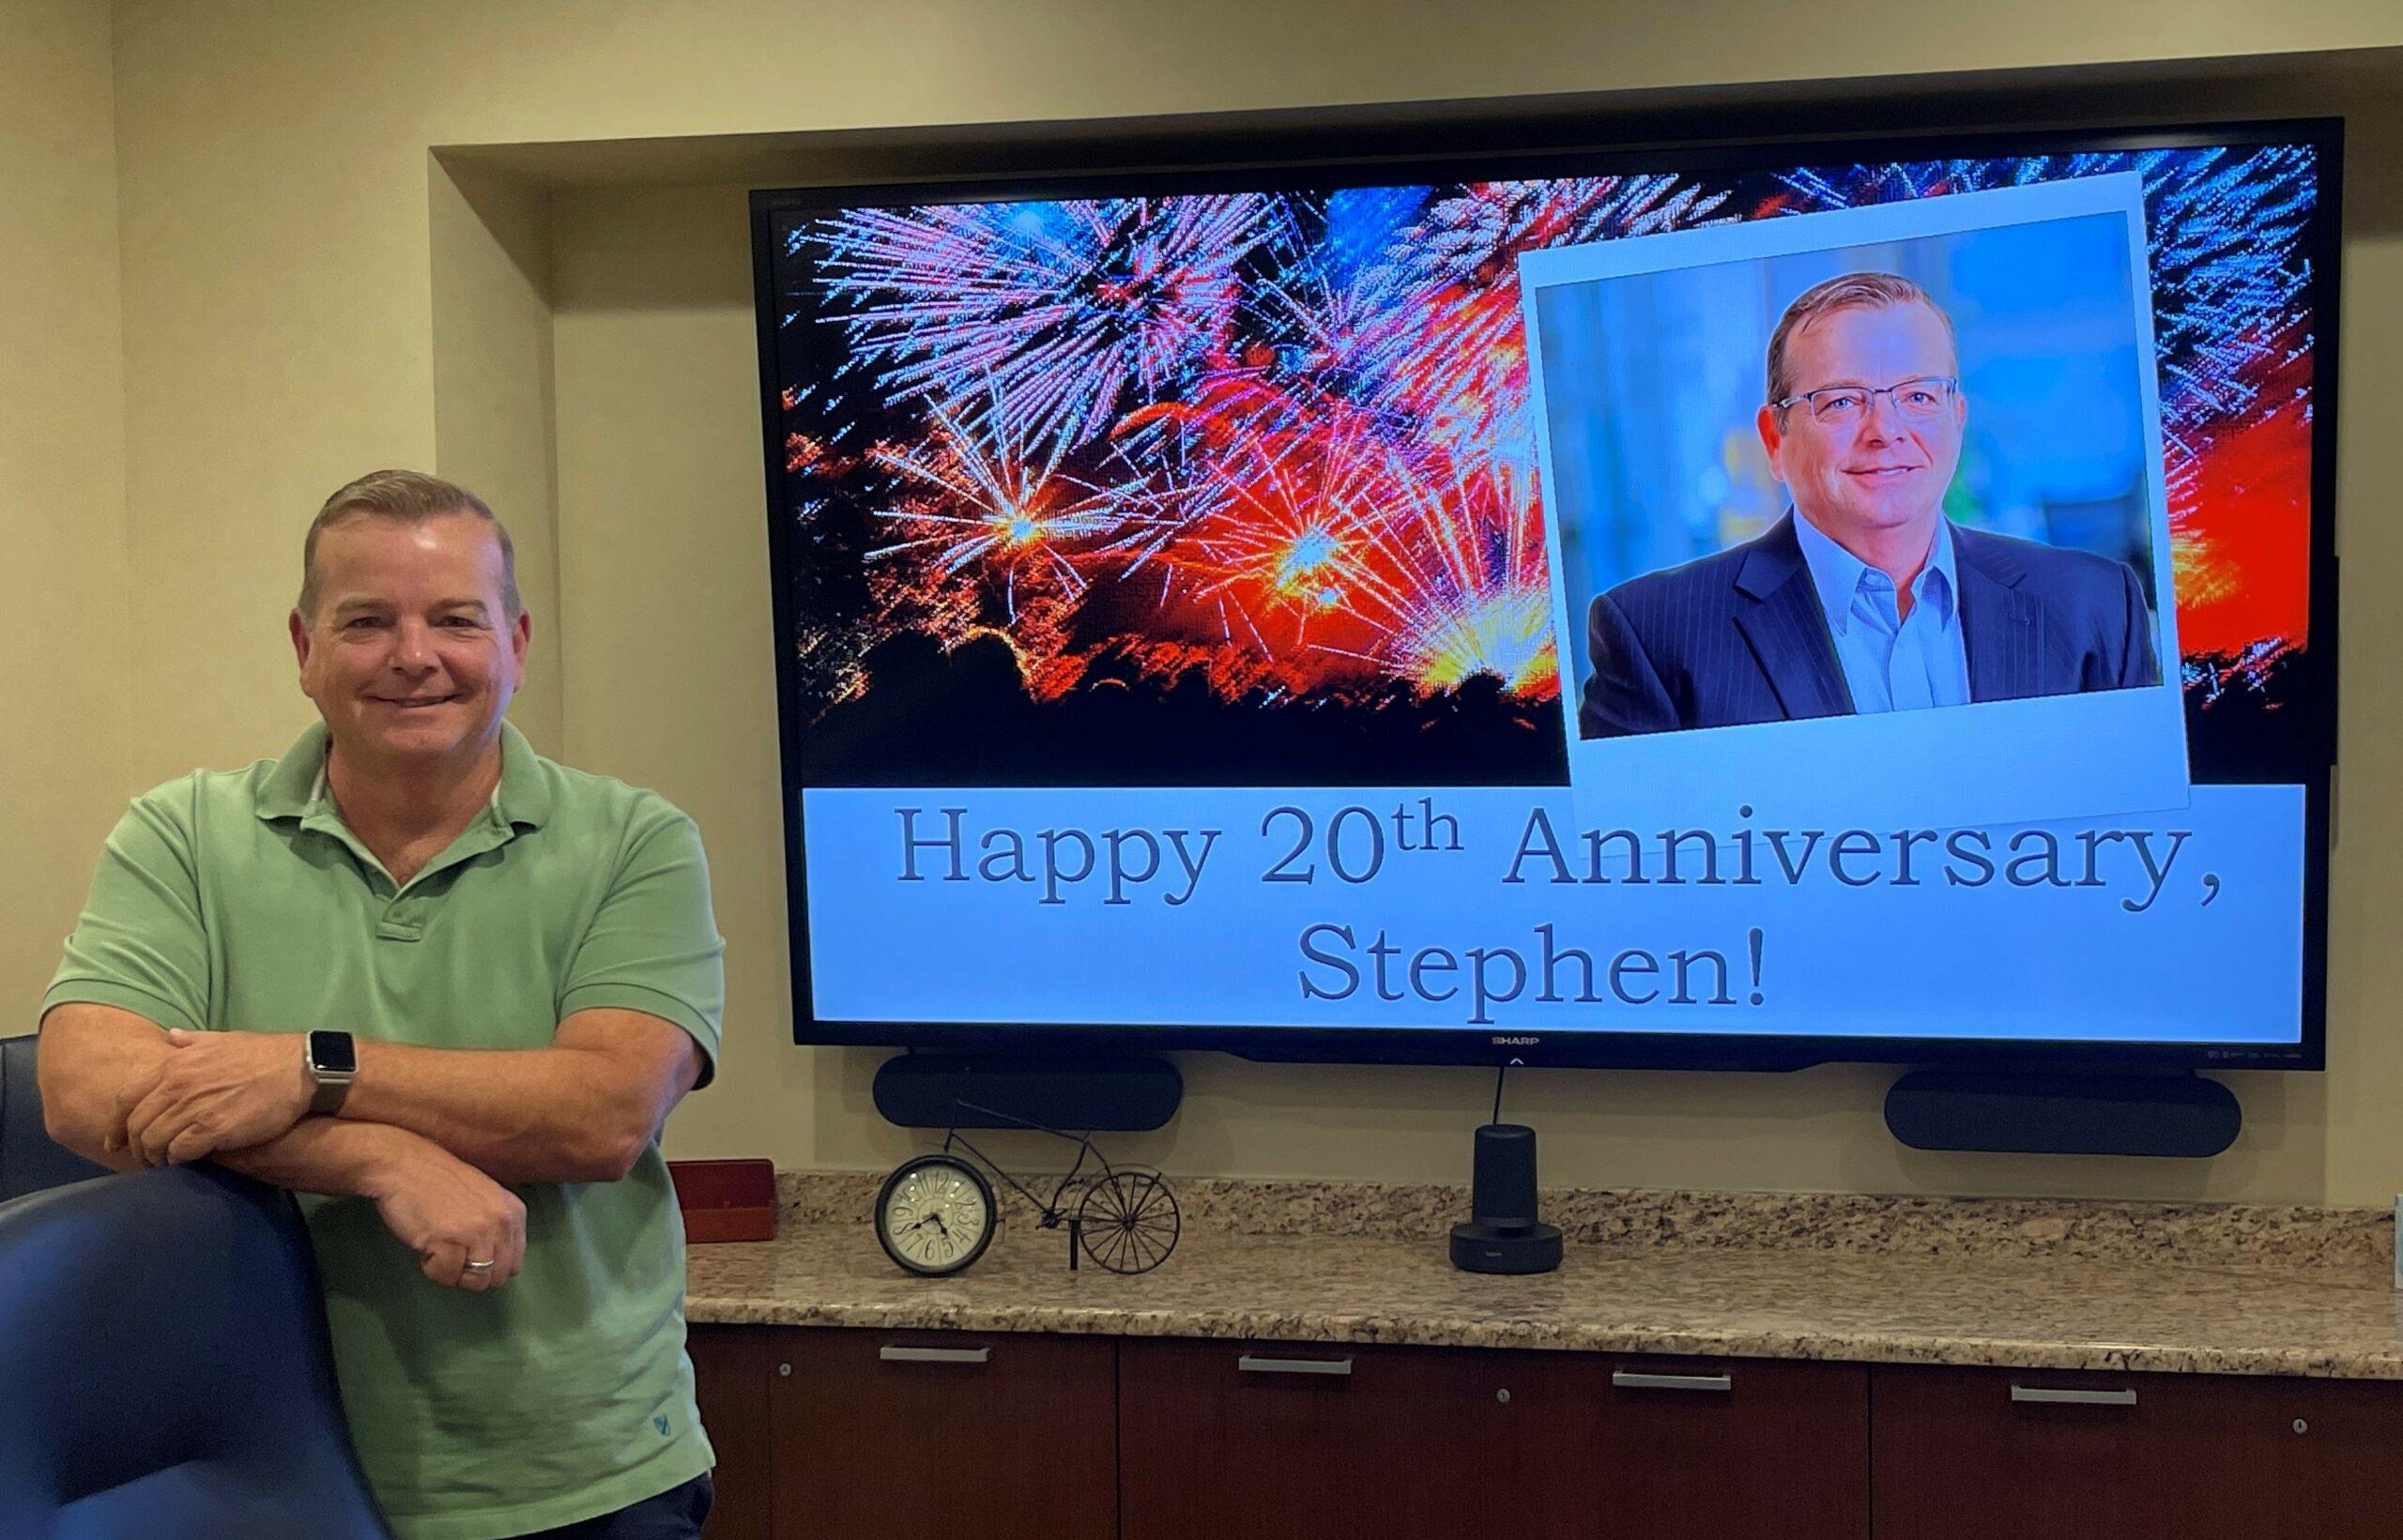 Celebrating Stephen Conyers' 20th Anniversary